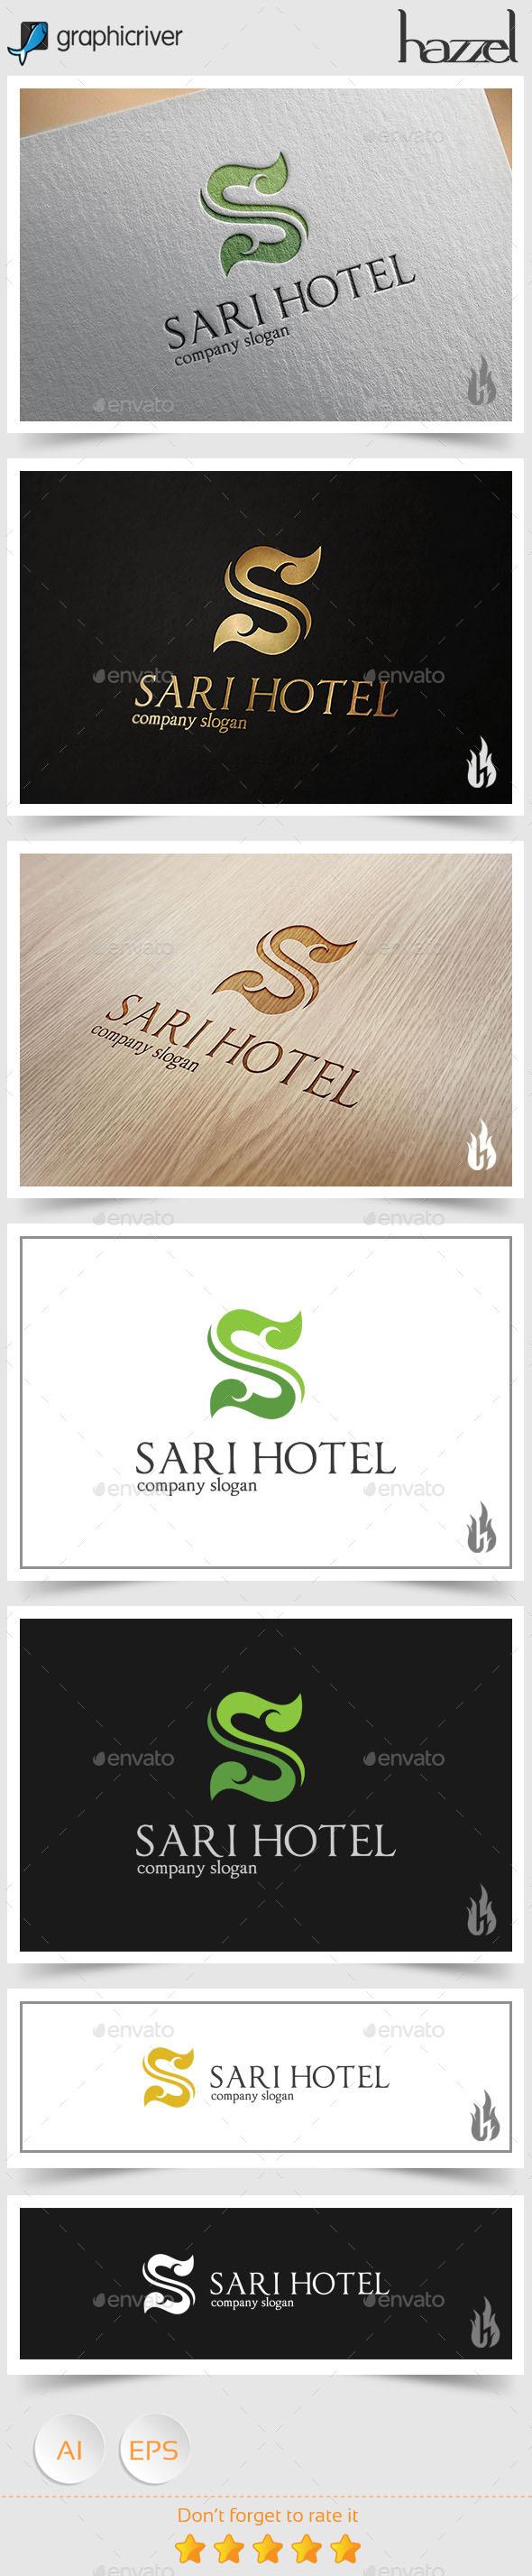 GraphicRiver Sari Hotel Logo 8927270